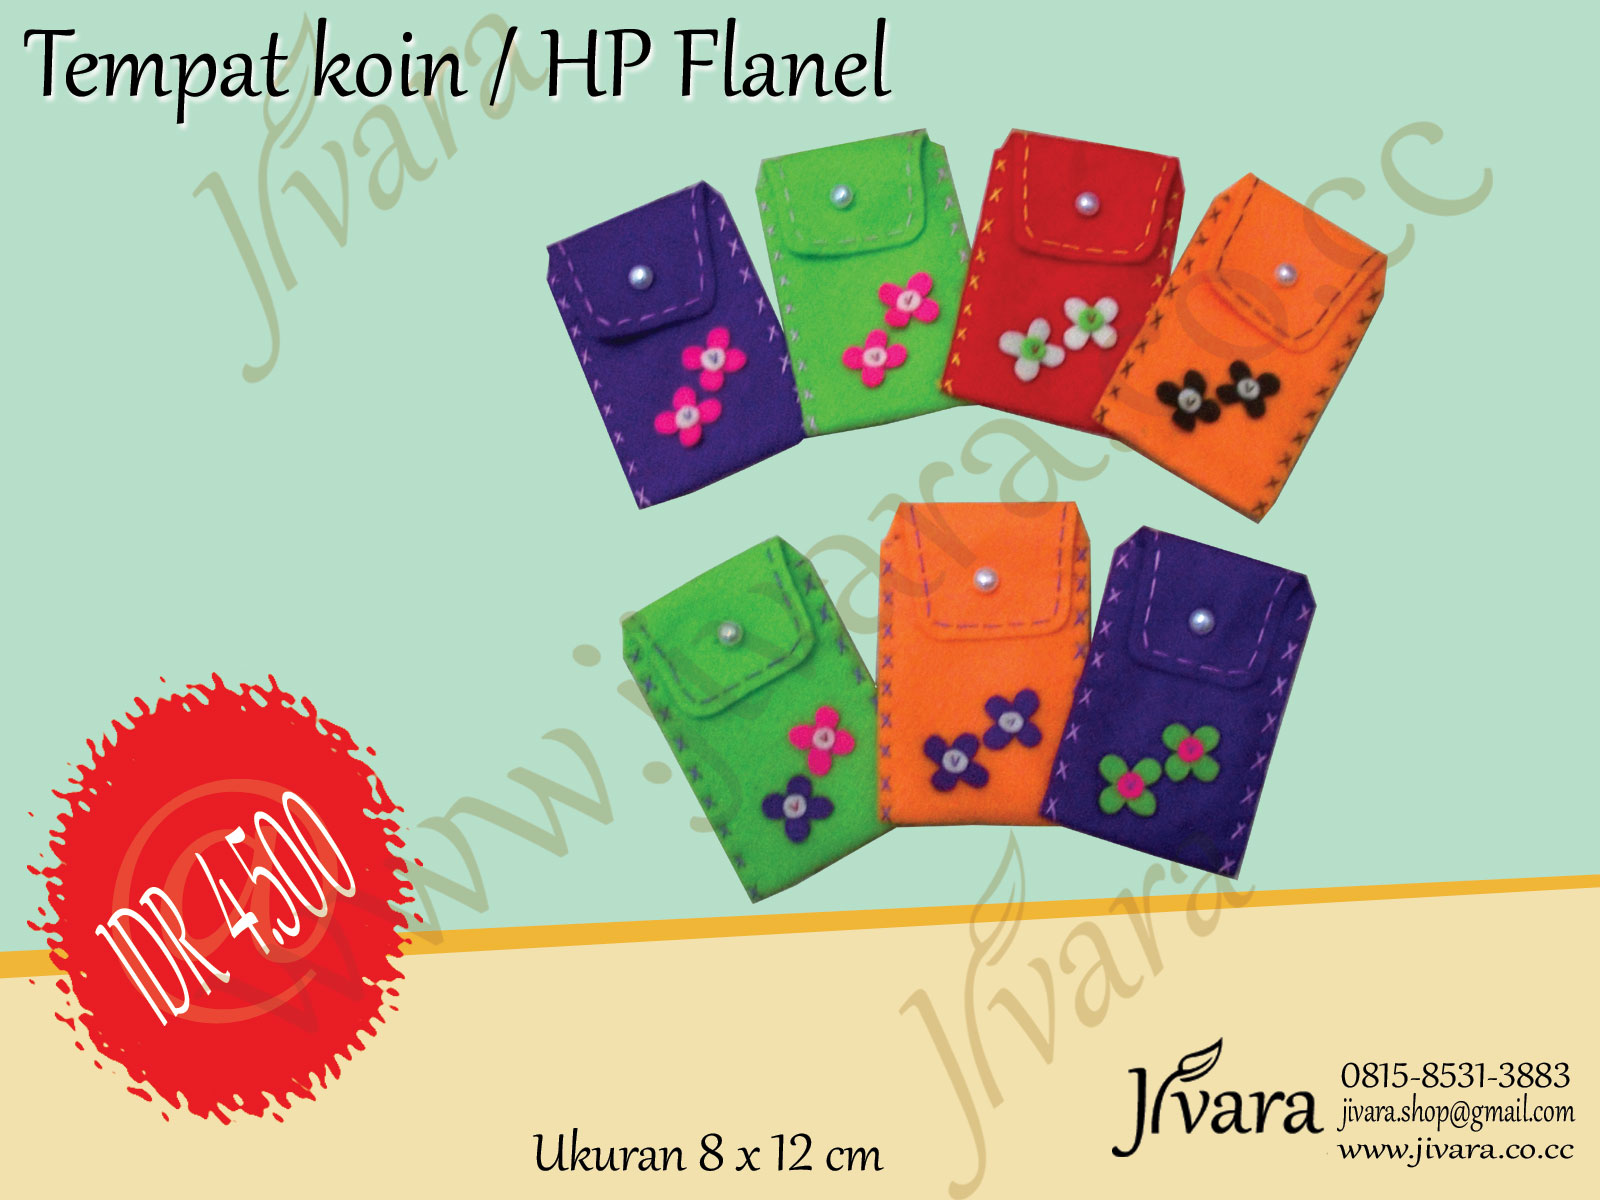 ... / felt yang dibuat tangan (hand made) khusus untuk anda dari JIVARA